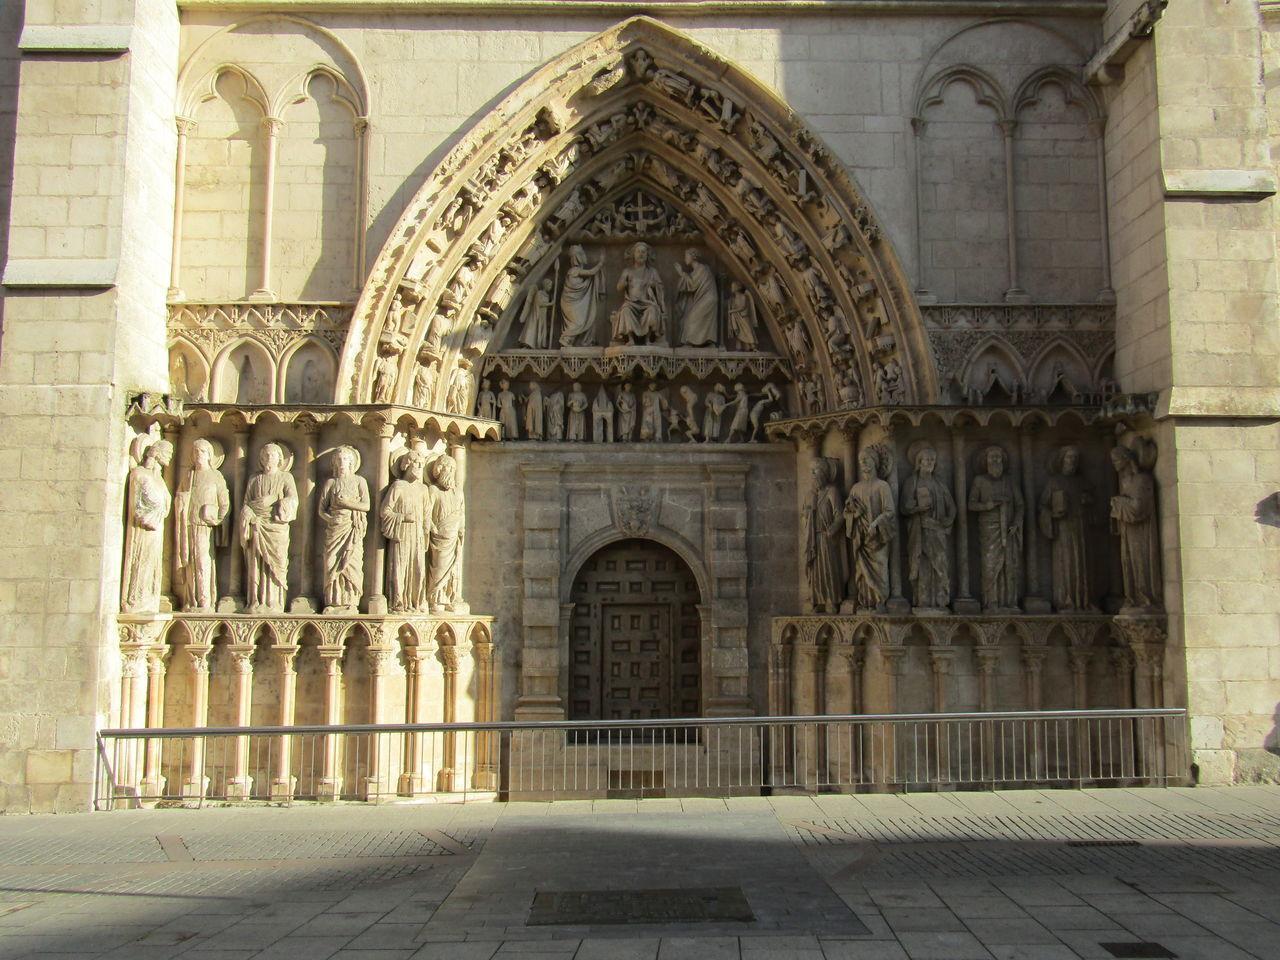 Architecture Arch Religion Travel Destinations Pilgrimage Kathedrale Cathedral Church Kirche Burgos SPAIN Spanien Tourism Santa Maria